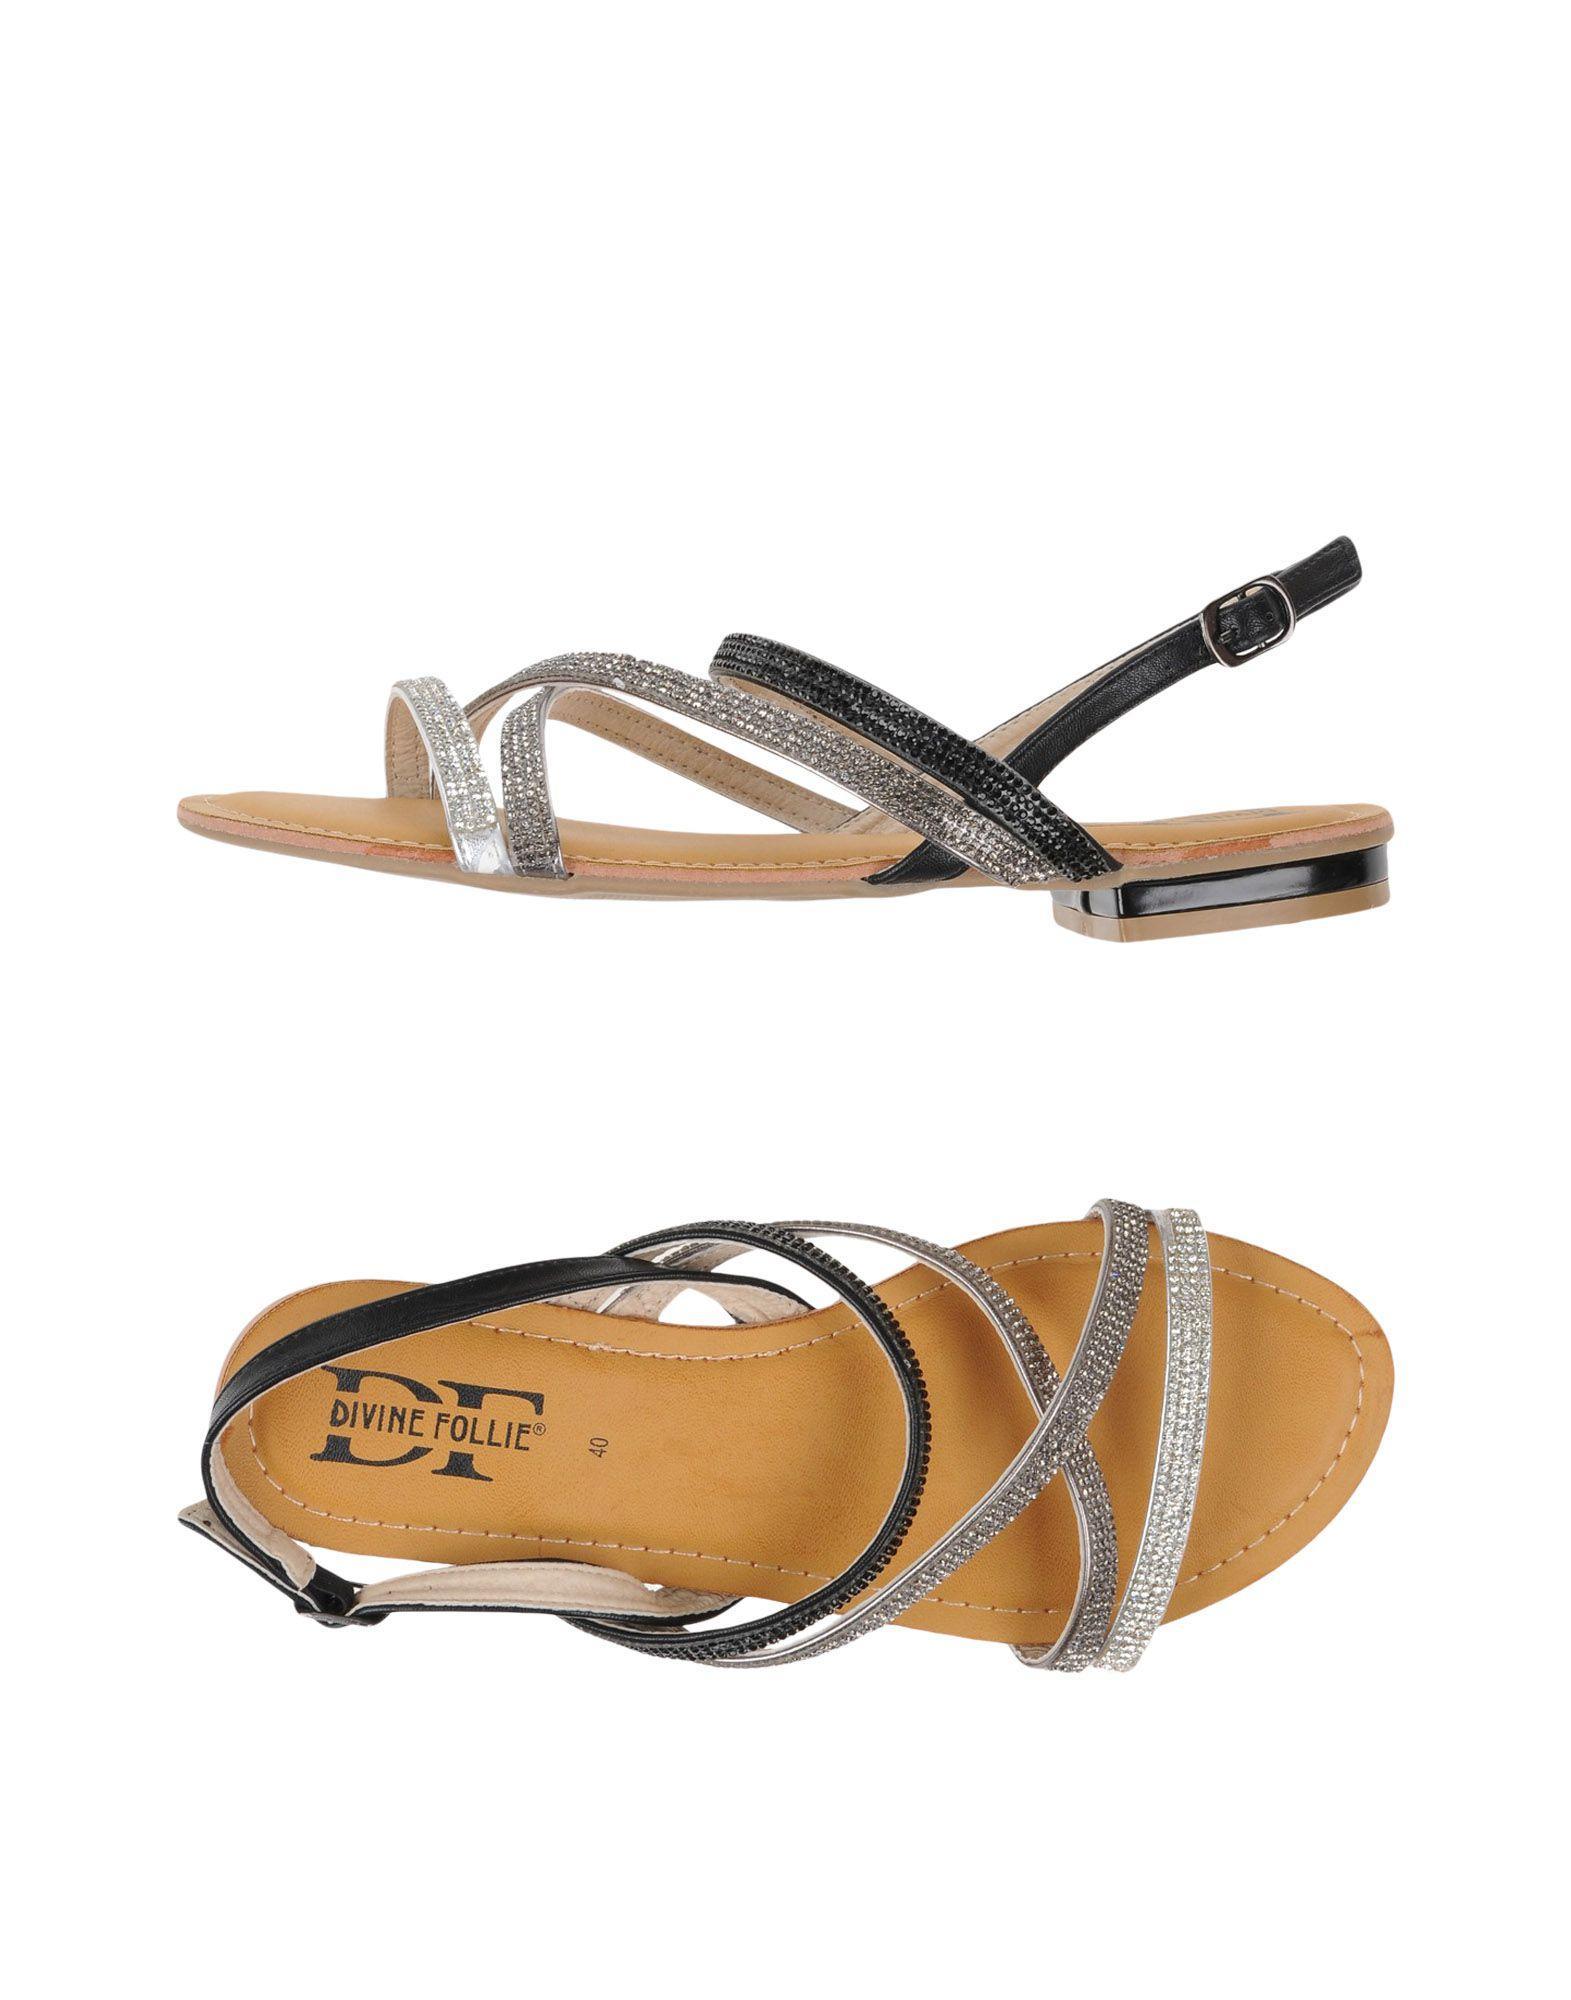 865621b4f89251 Lyst - Divine Follie Sandals in Metallic